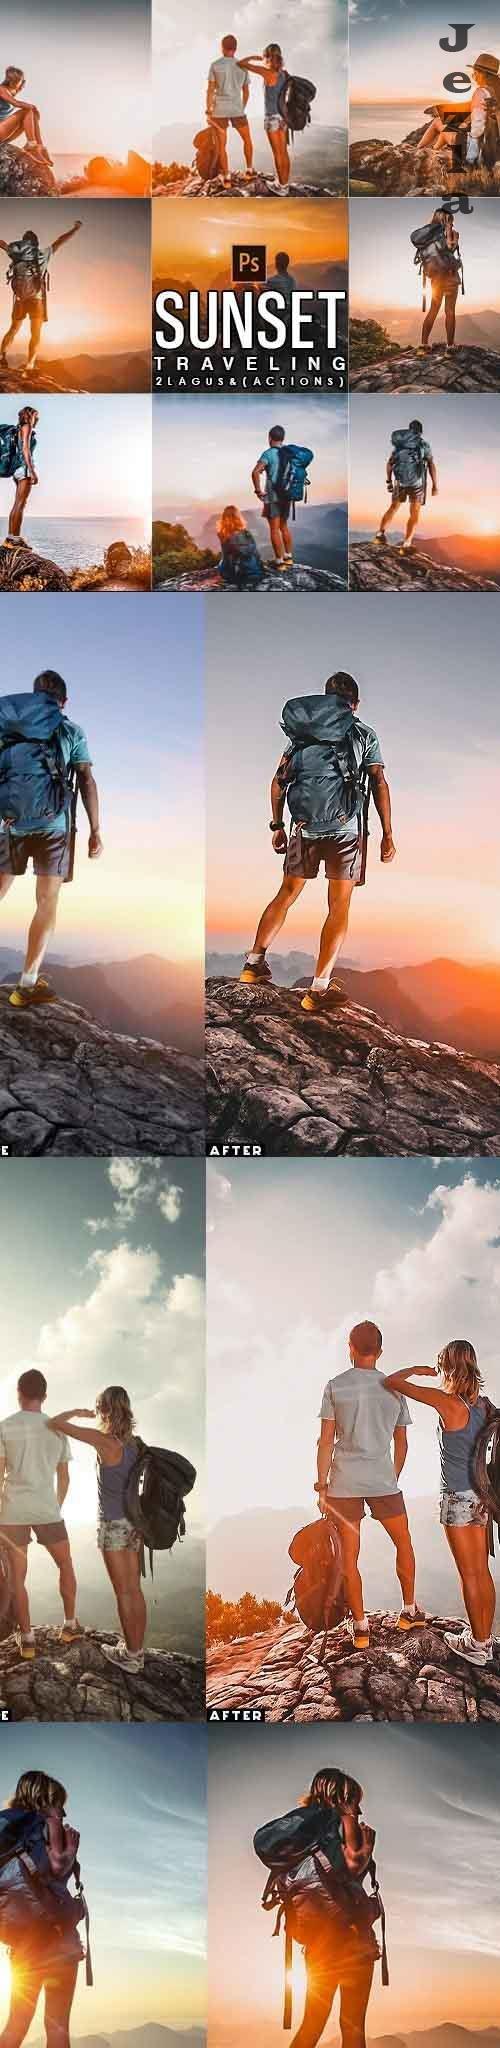 Sunset Traveling Photoshop Actions - 29002653